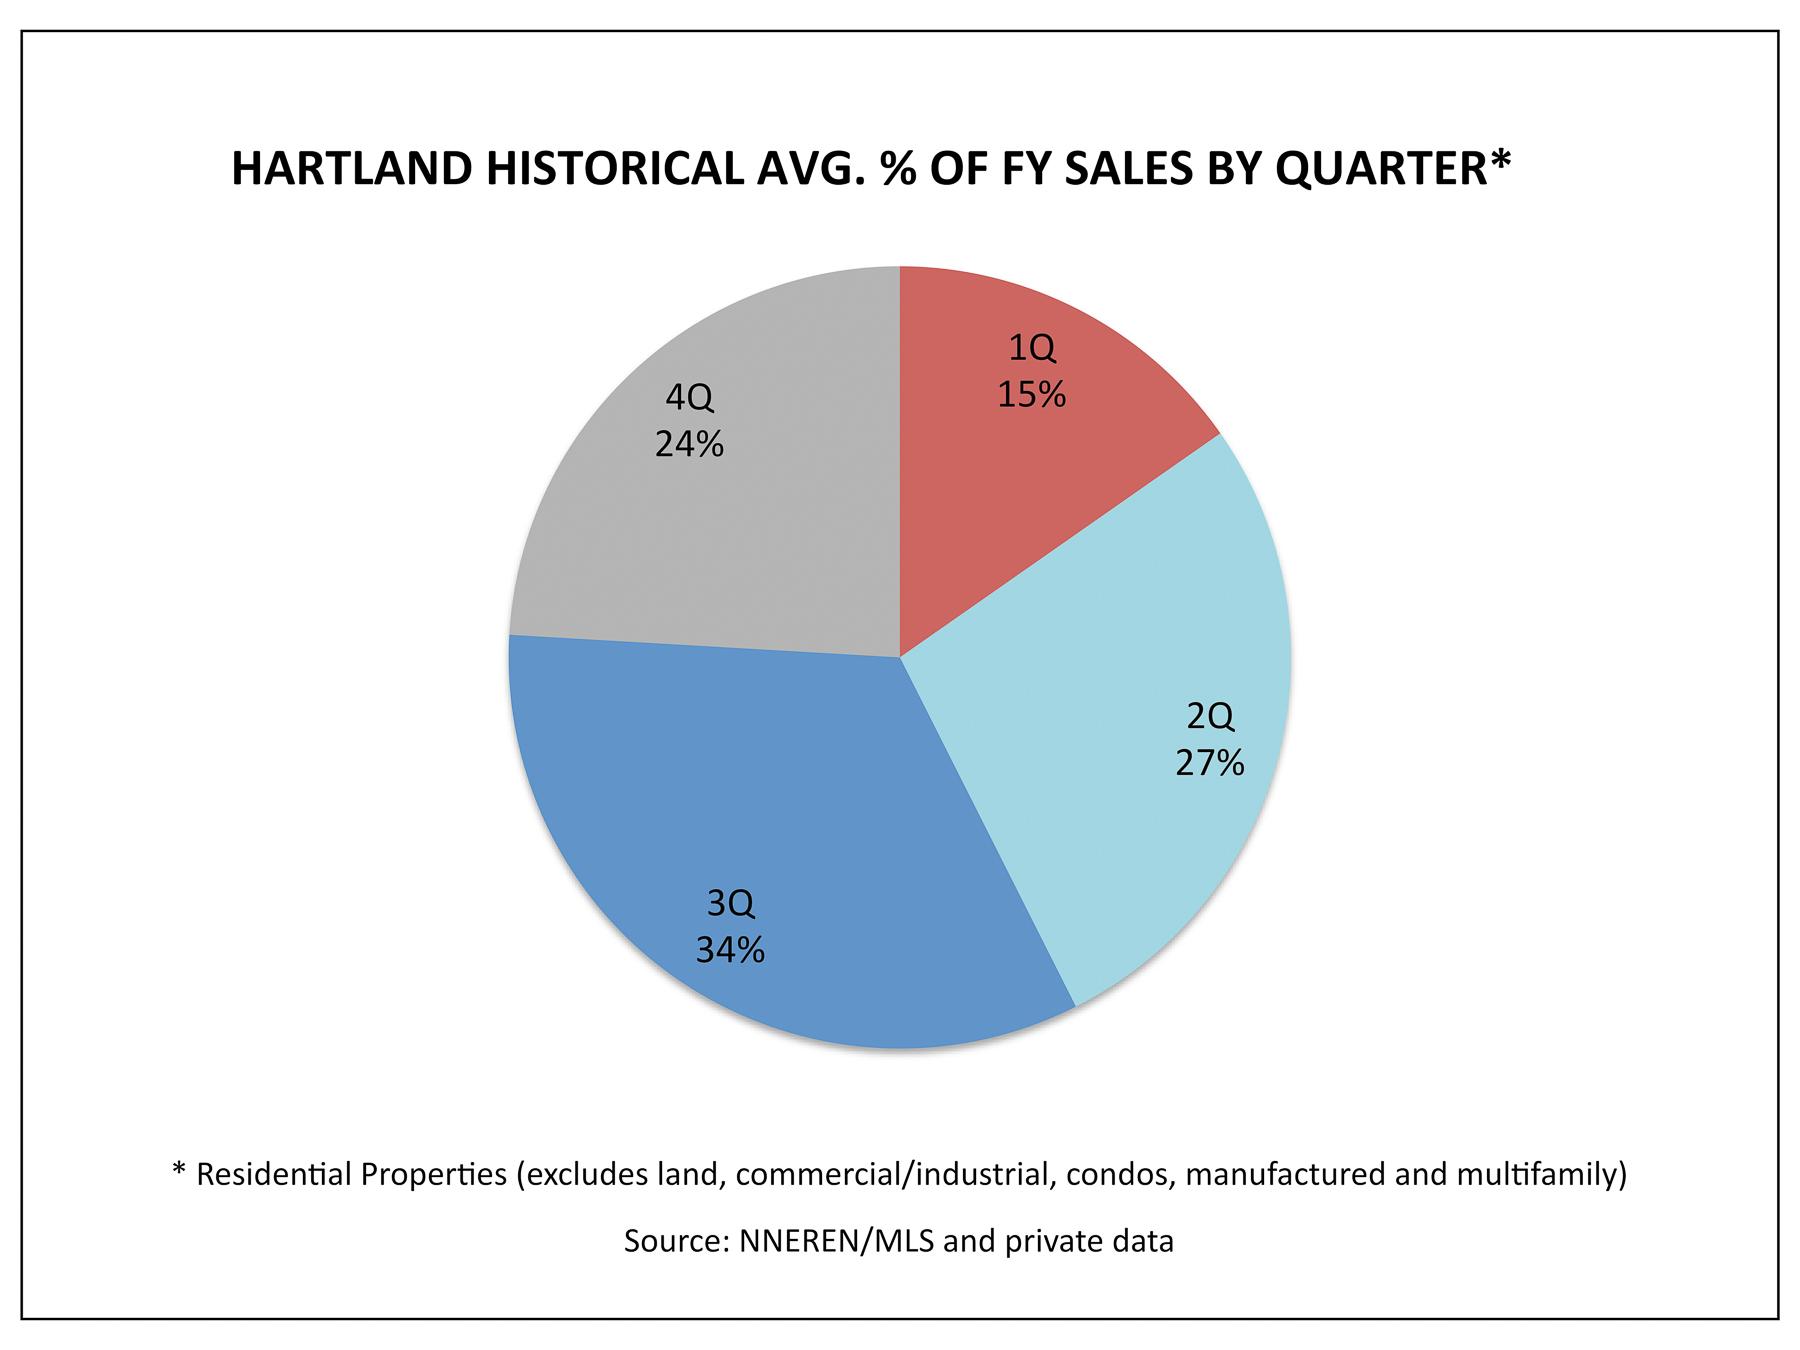 Hartland VT Real Estate Market - 1Q Historical Avg % Homes Sold by Quarter